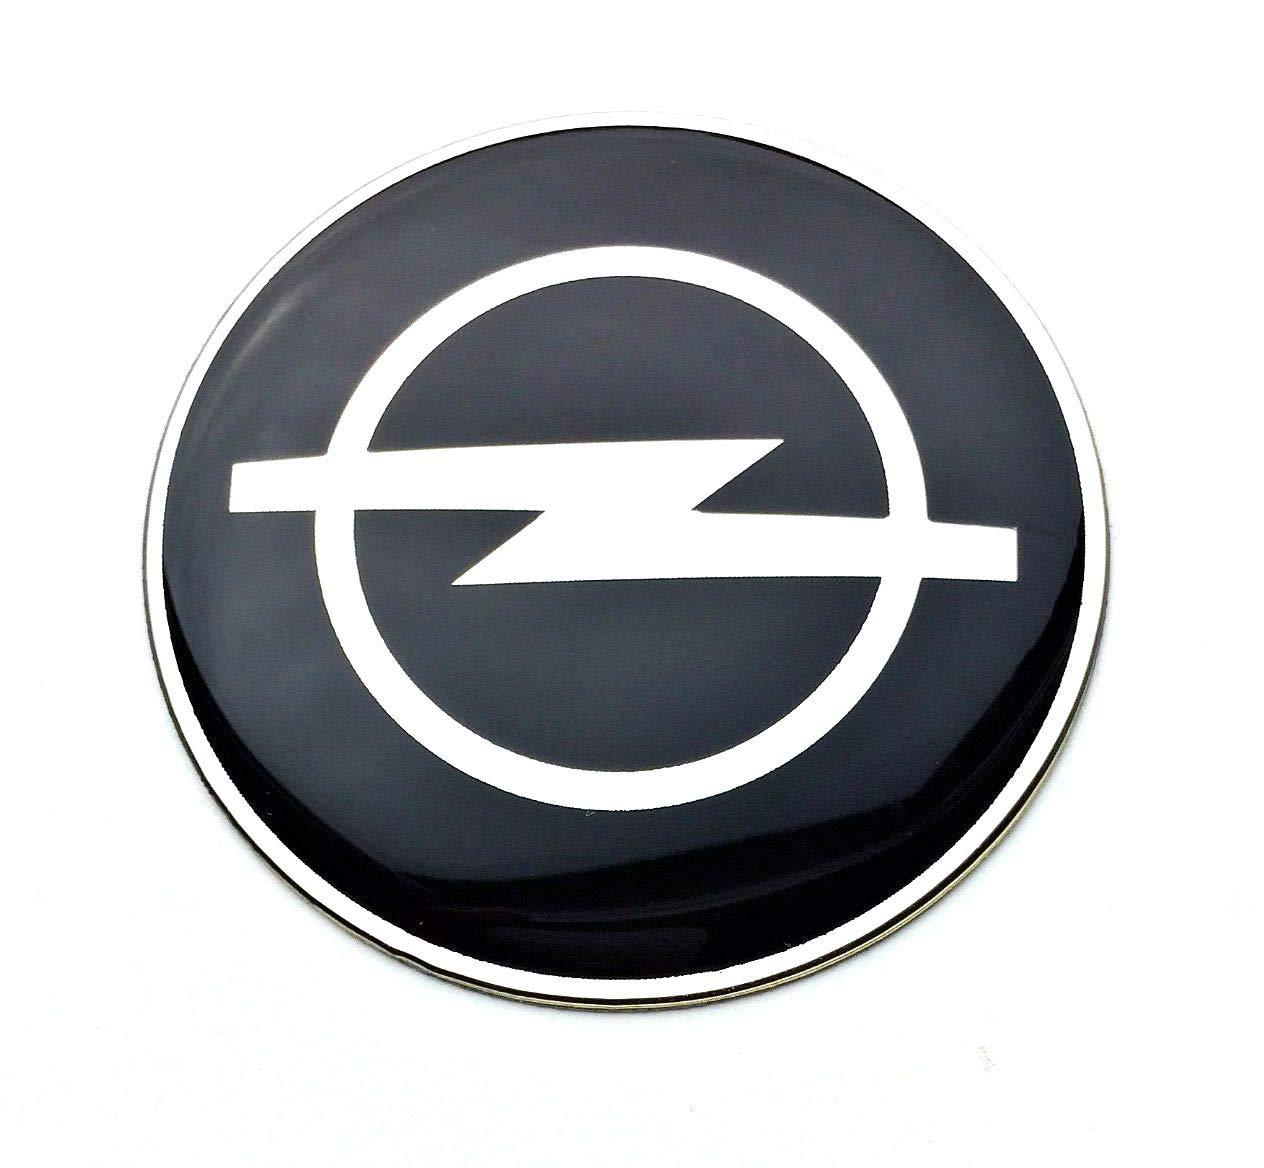 tapacubos OpelLogo autoadhesivas Conjunto de 4 x 65mm pegatinas para central Tapas de rueda